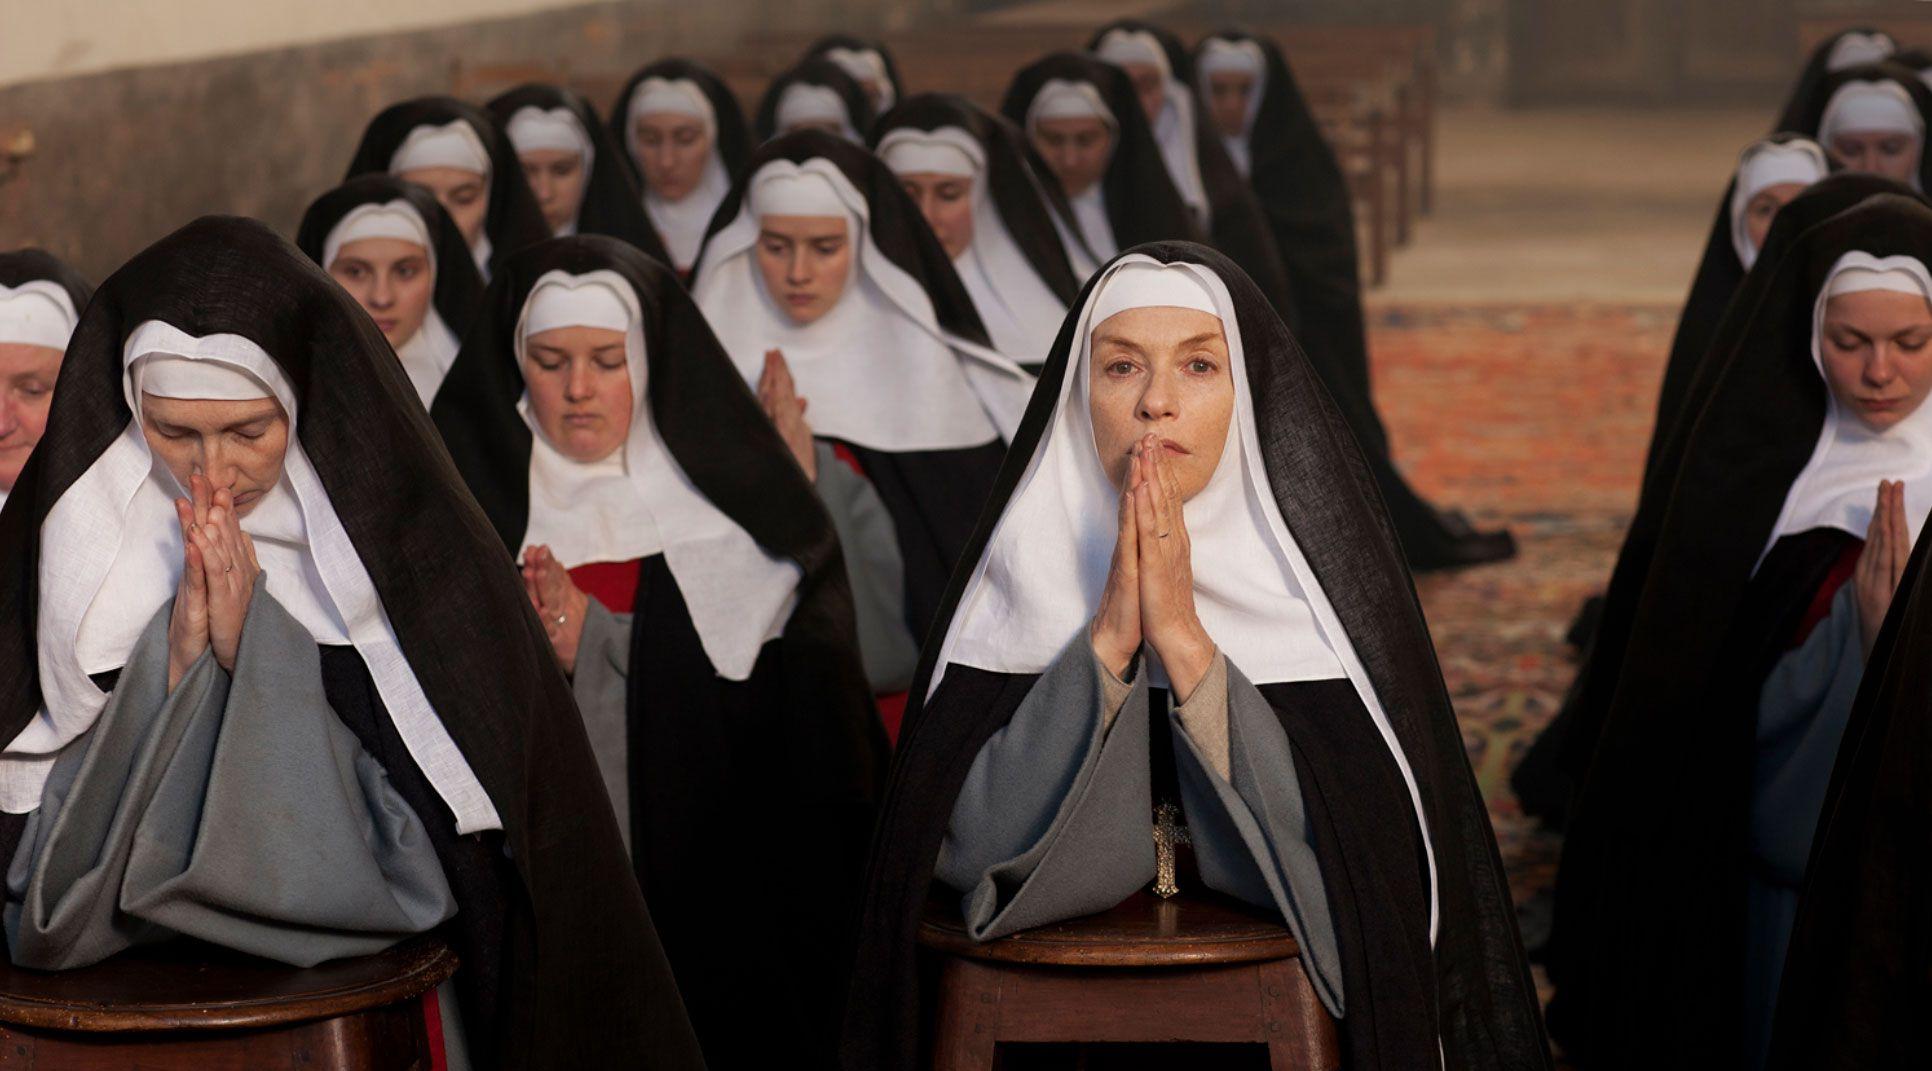 Depraved lesbian nuns photos